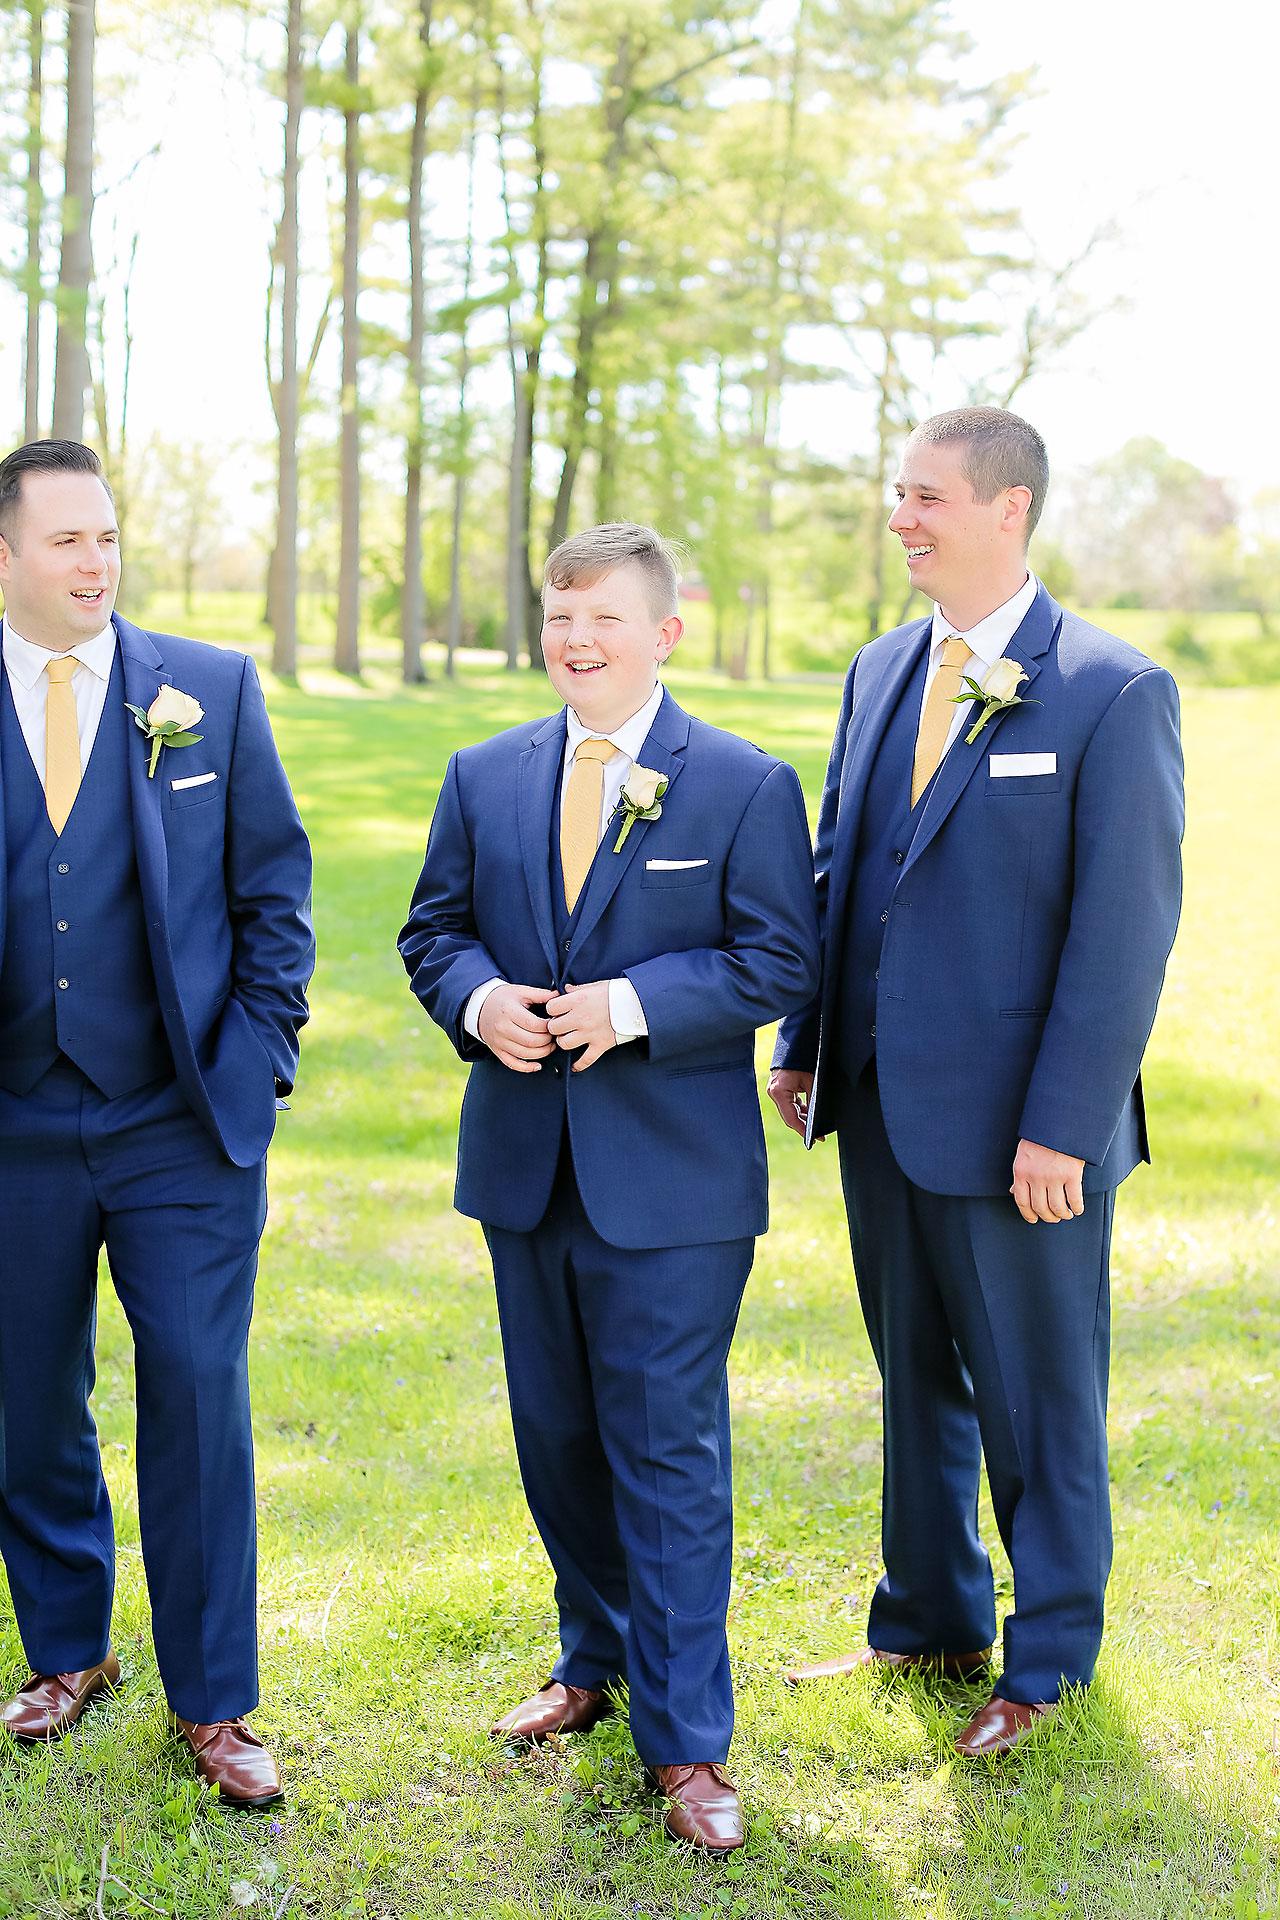 Nadia Parker Black Iris Estate Carmel Indiana Wedding May 2021 101